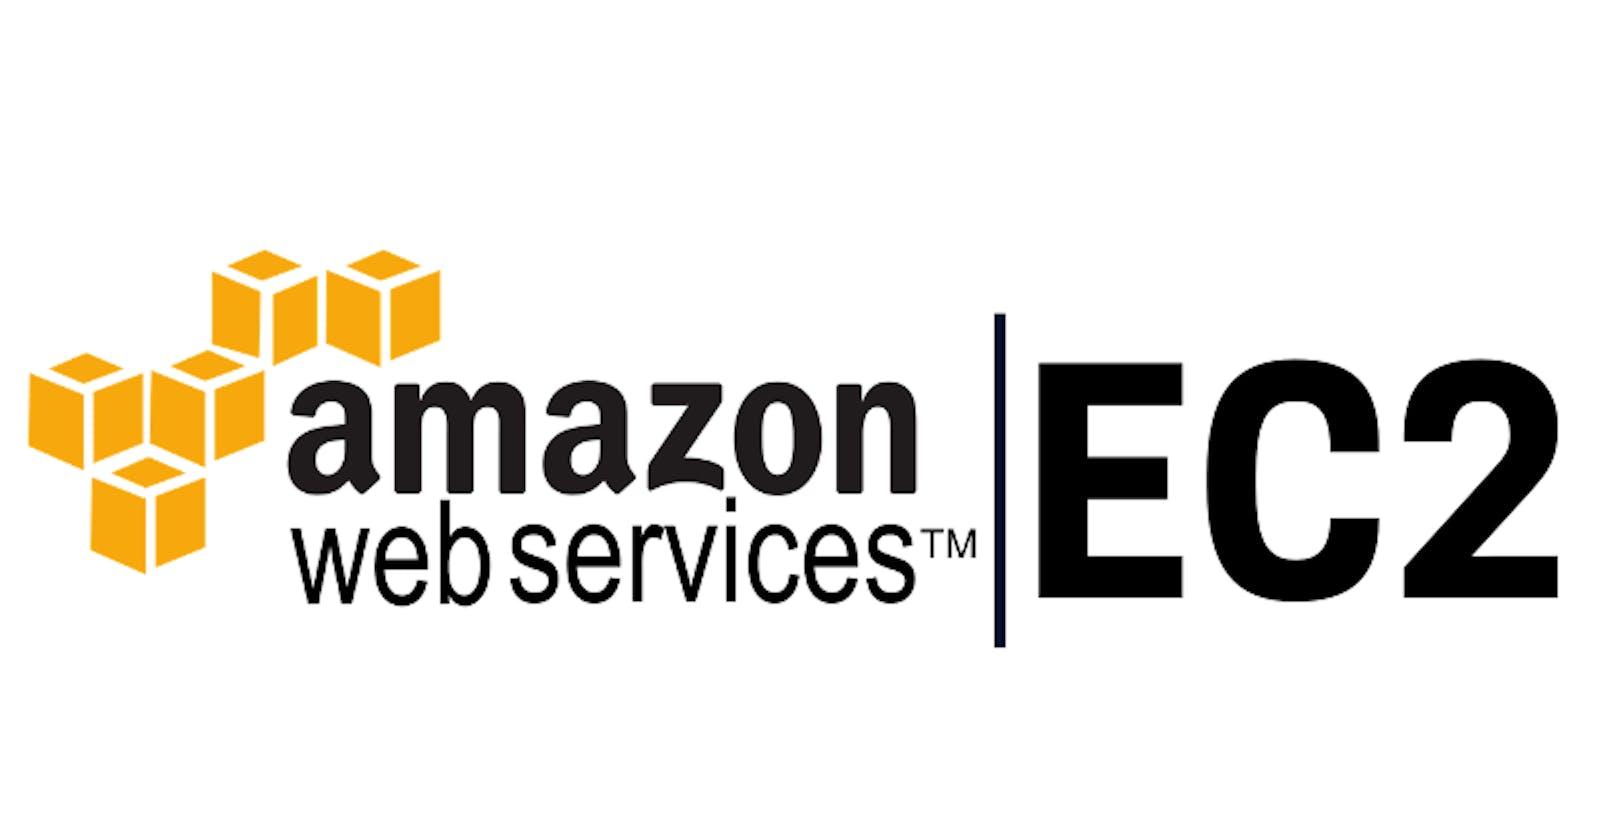 Launch your first AWS Cloud EC2 Server (Windows )